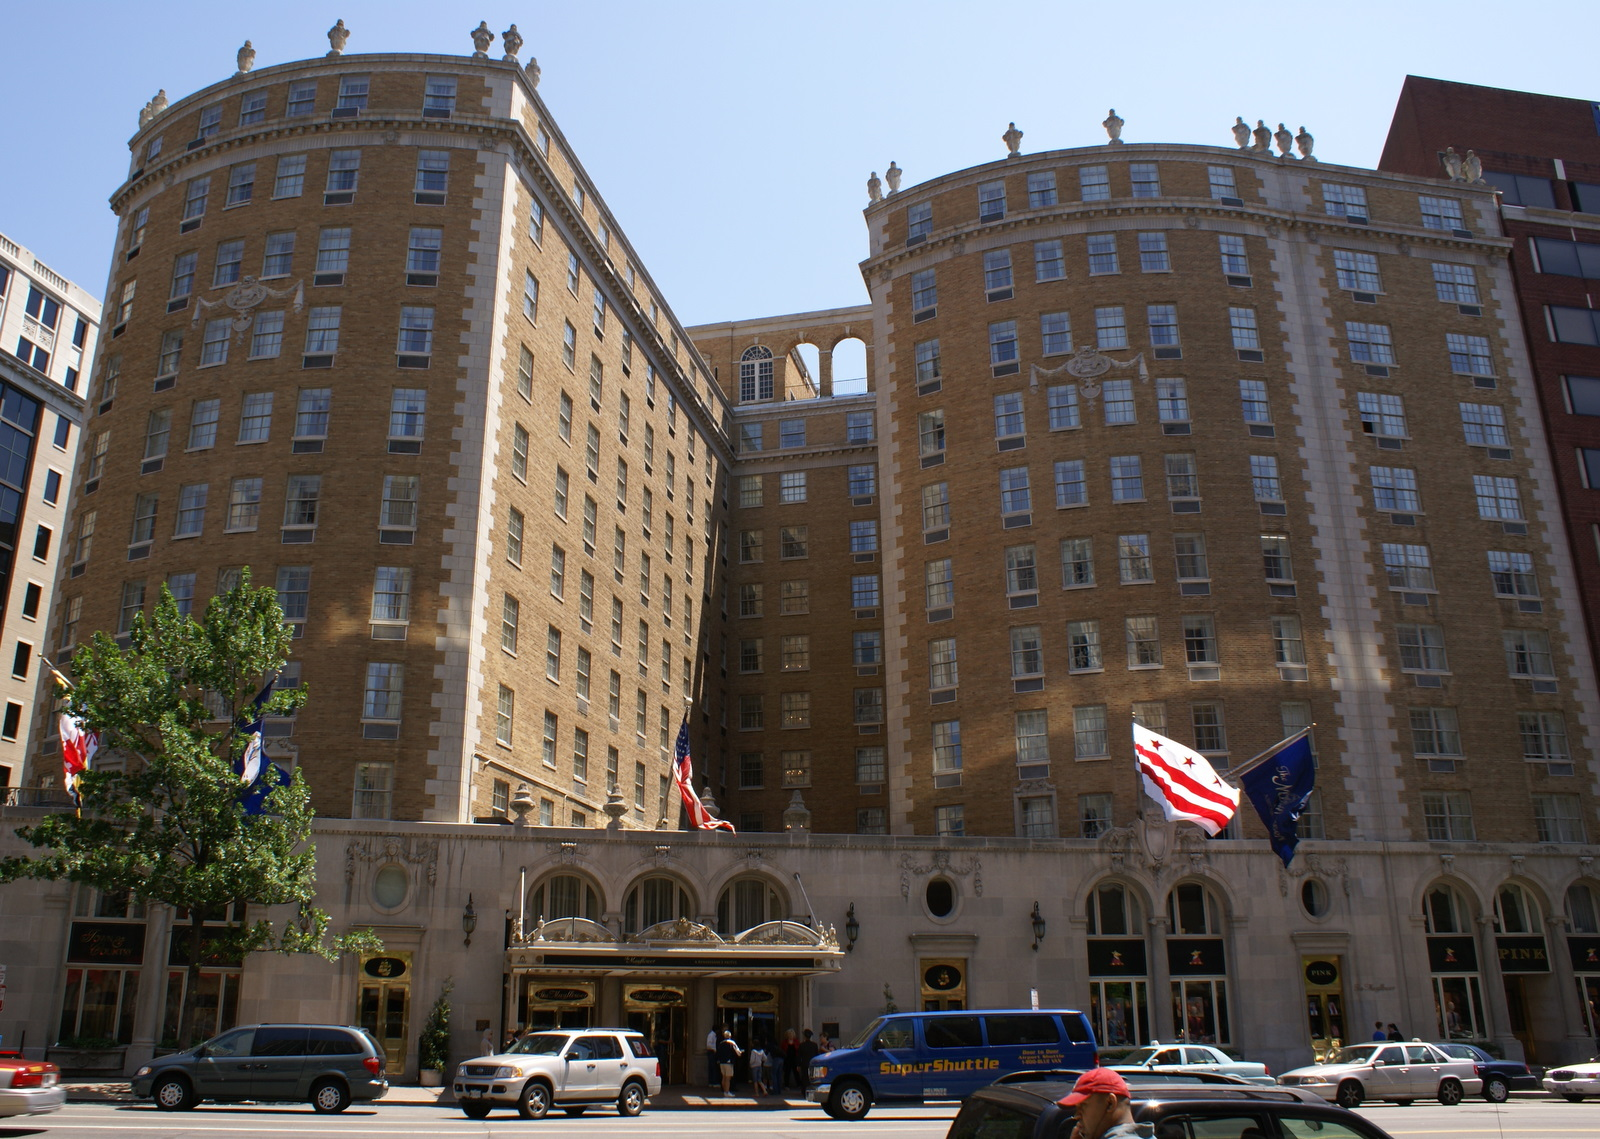 File:Mayflower Hotel In Washington, D.C..jpg